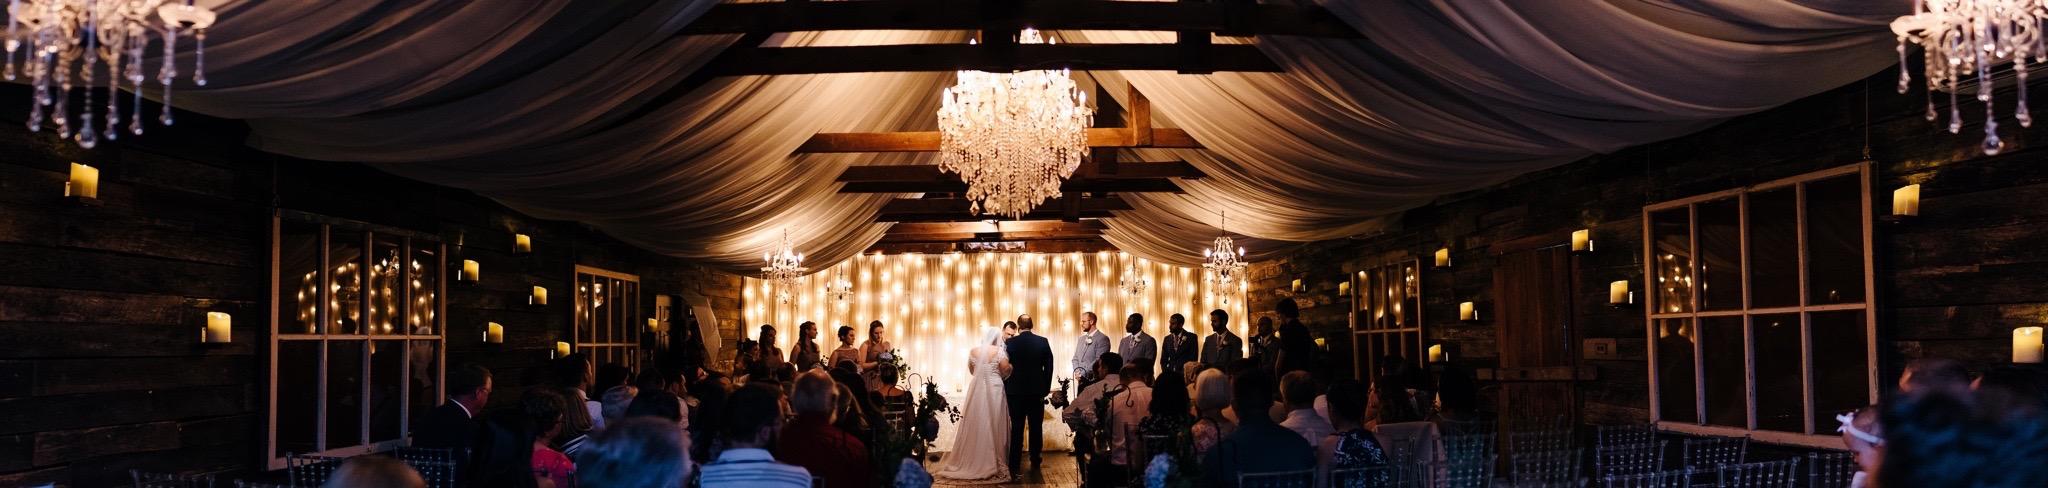 intimate_kyle_house_wedding_virginia_jonathan_hannah_photography-11.jpg